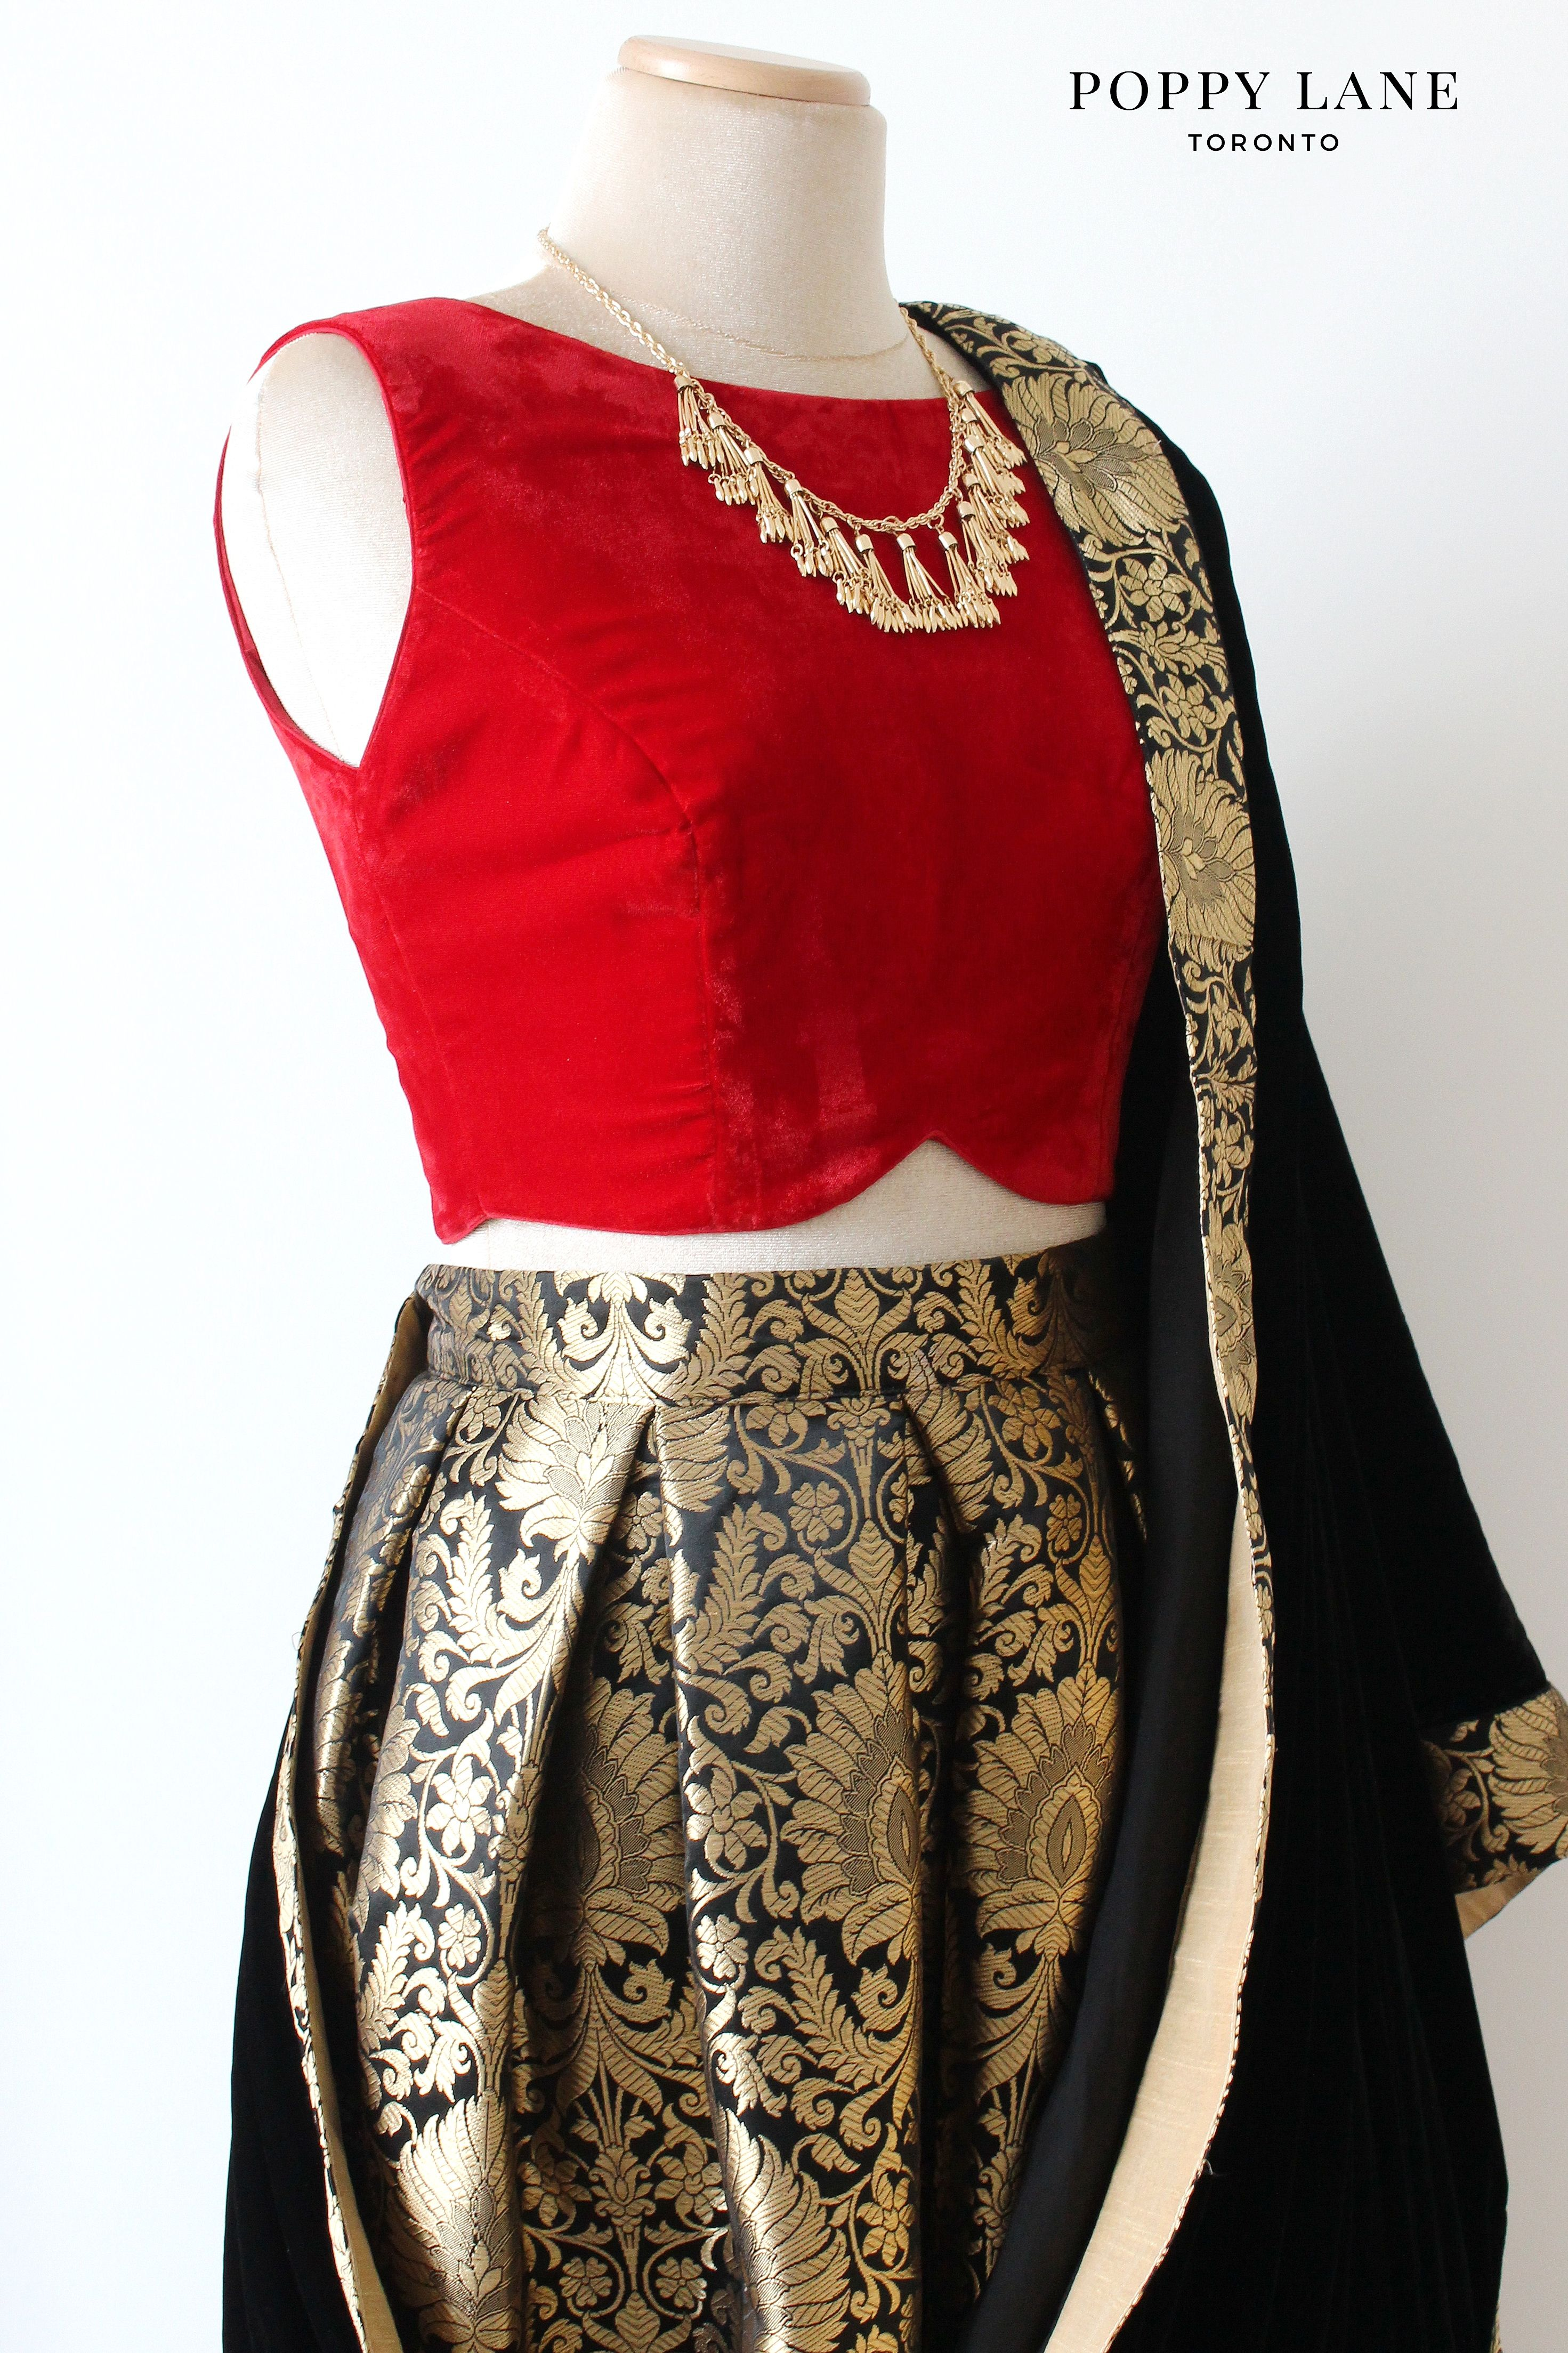 Bright Red Velvet Sari/Lengha Crop Top Blouses with Royal Black Brocade Skirts + Velvet Dupattas! Shop now at poppylane.ca